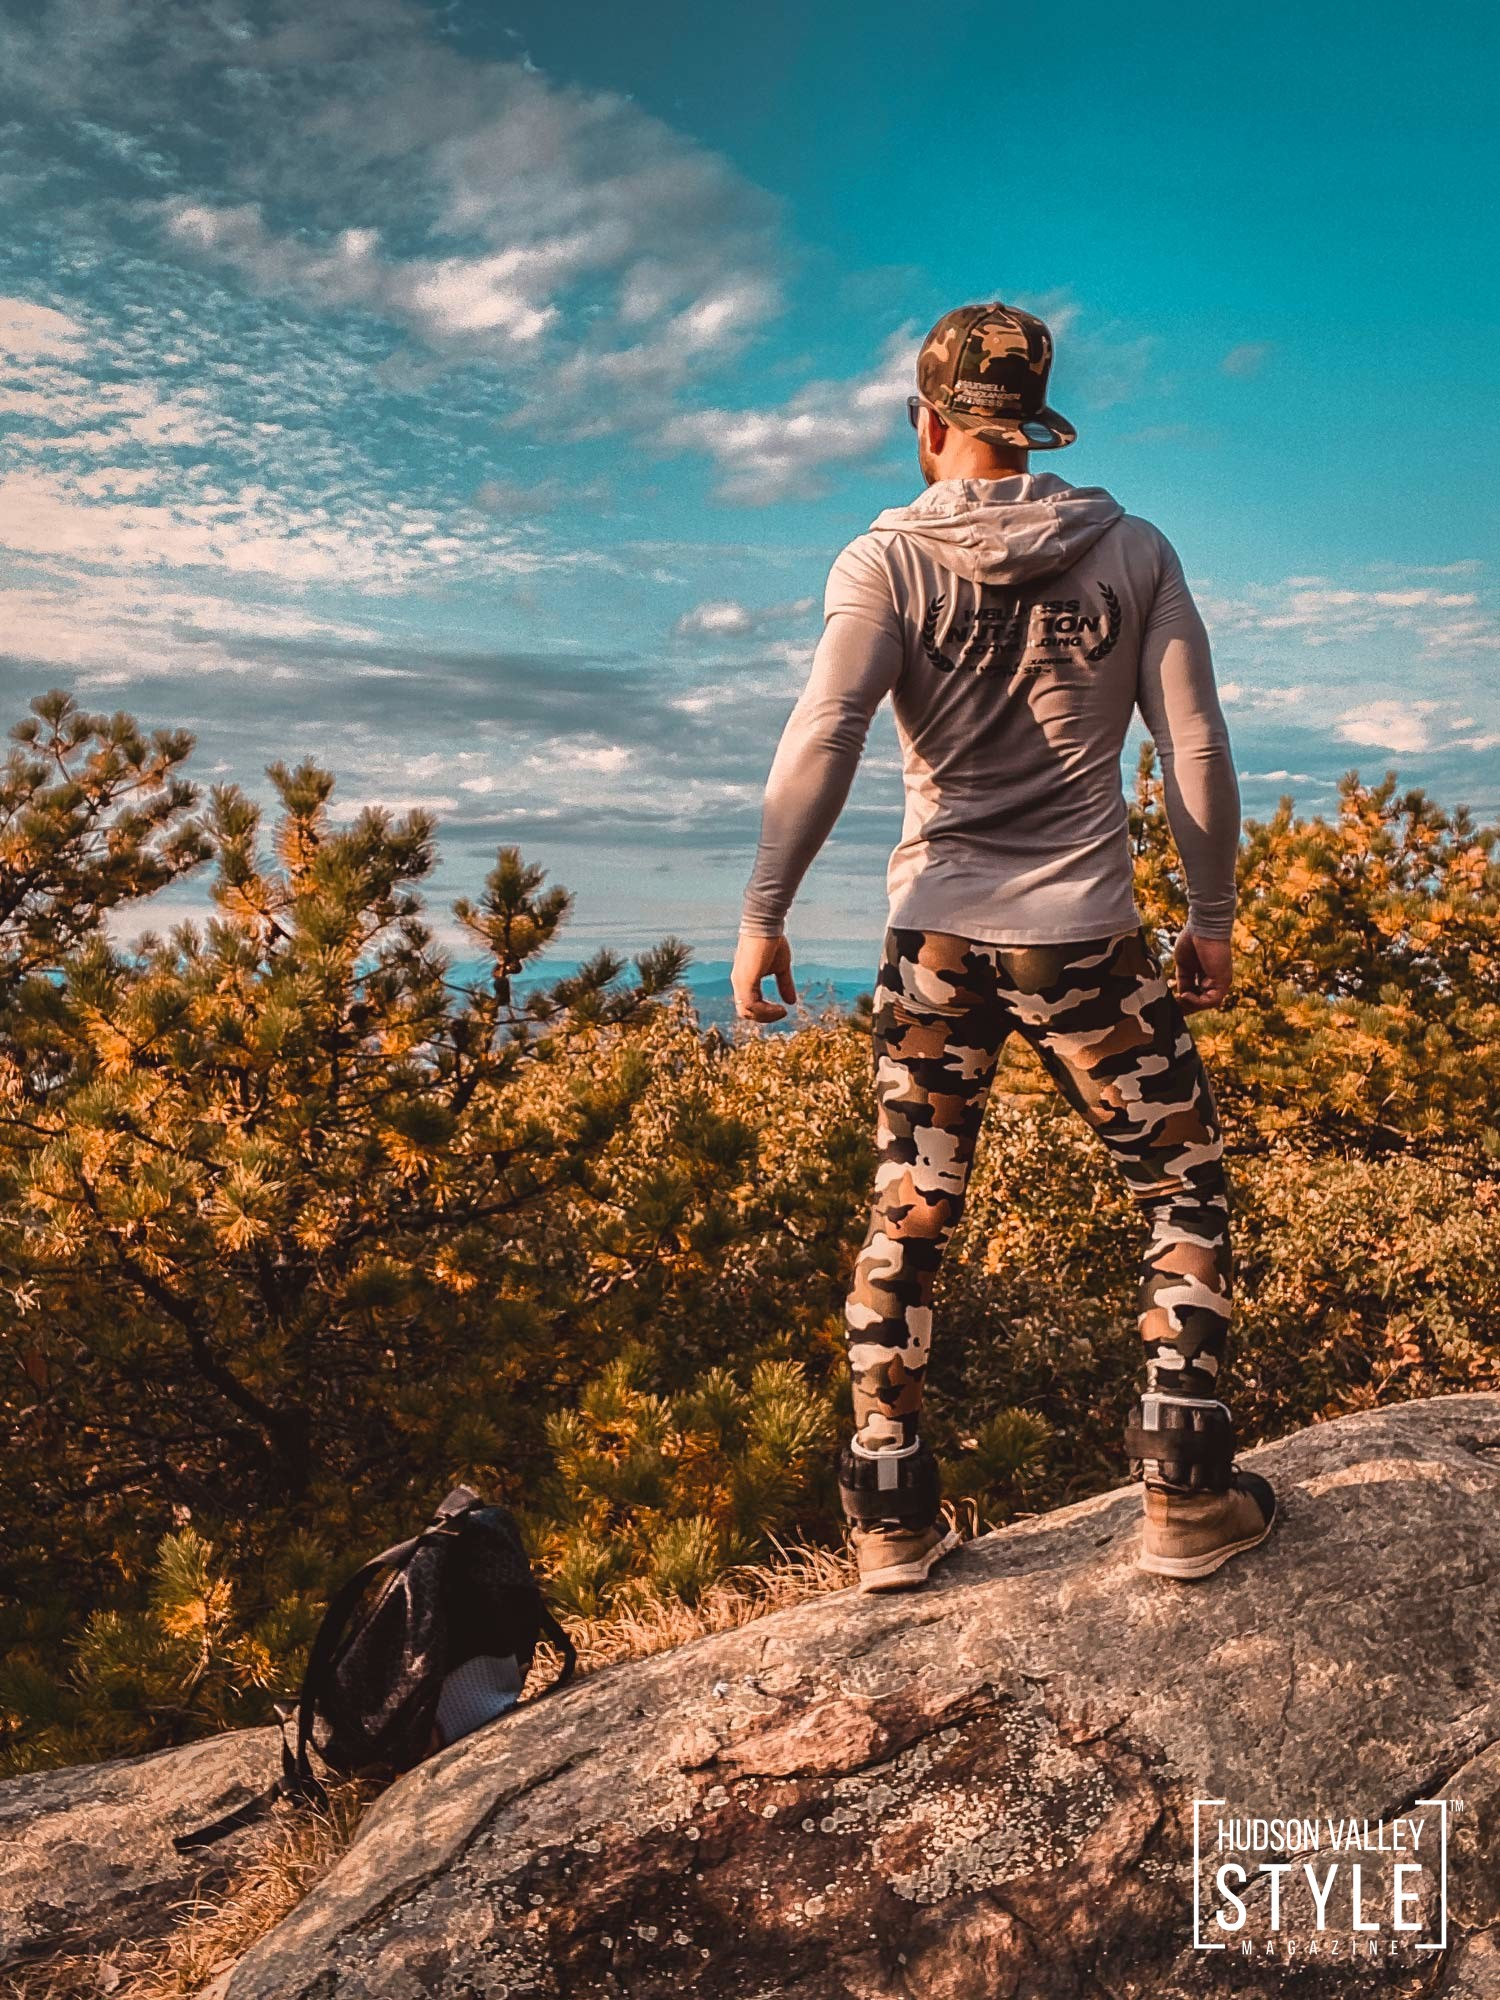 Men's Leggings, Bodybuilding Clothing, Men's Tights, Tights for Men, Fitness Apparel, Bodybuilding Apparel, Men's Fitness Pants by Sokowear